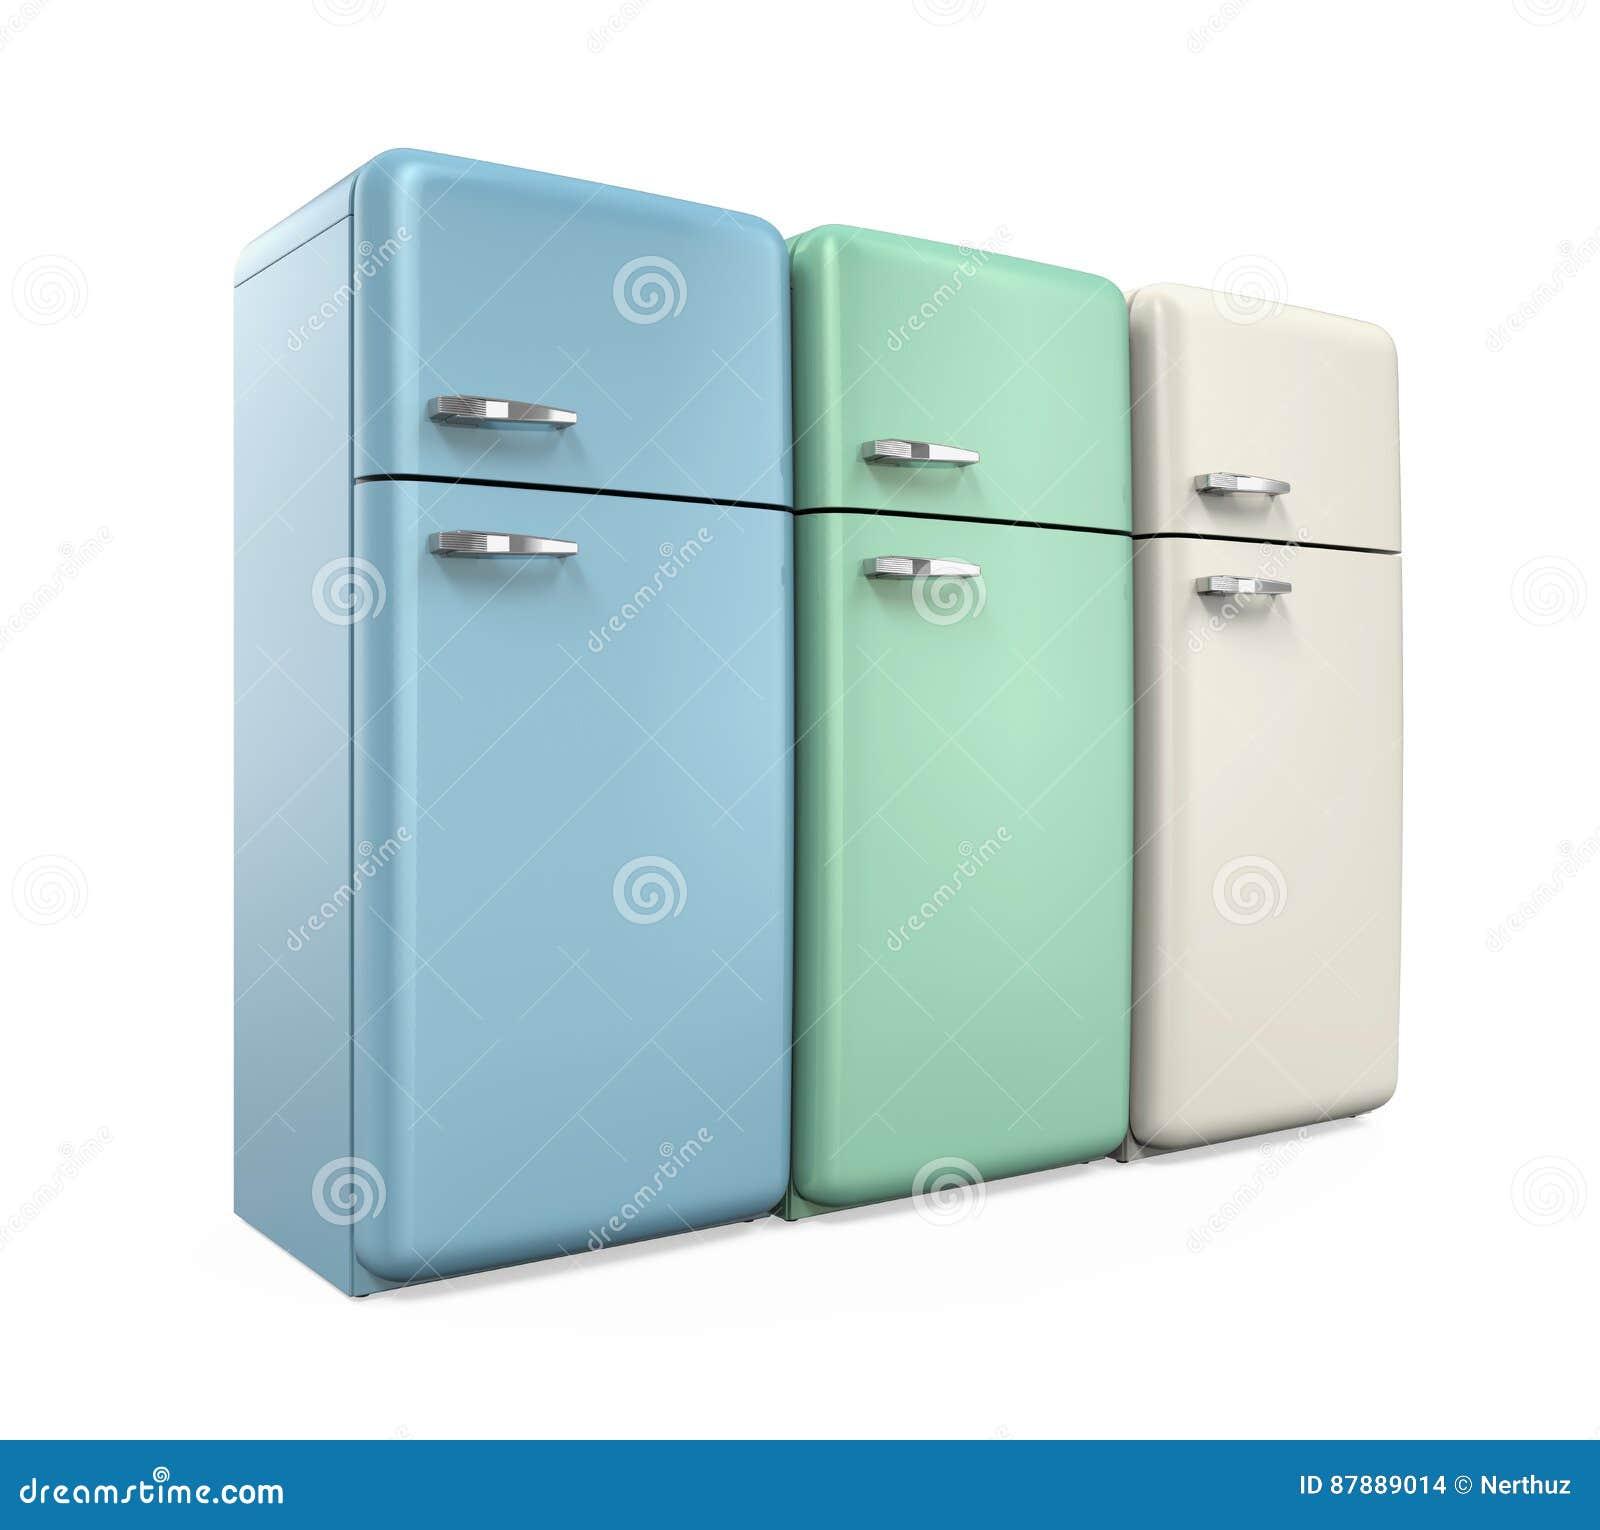 Retrokühlschränke  Retro- Kühlschränke Lokalisiert Stock Abbildung - Illustration von ...